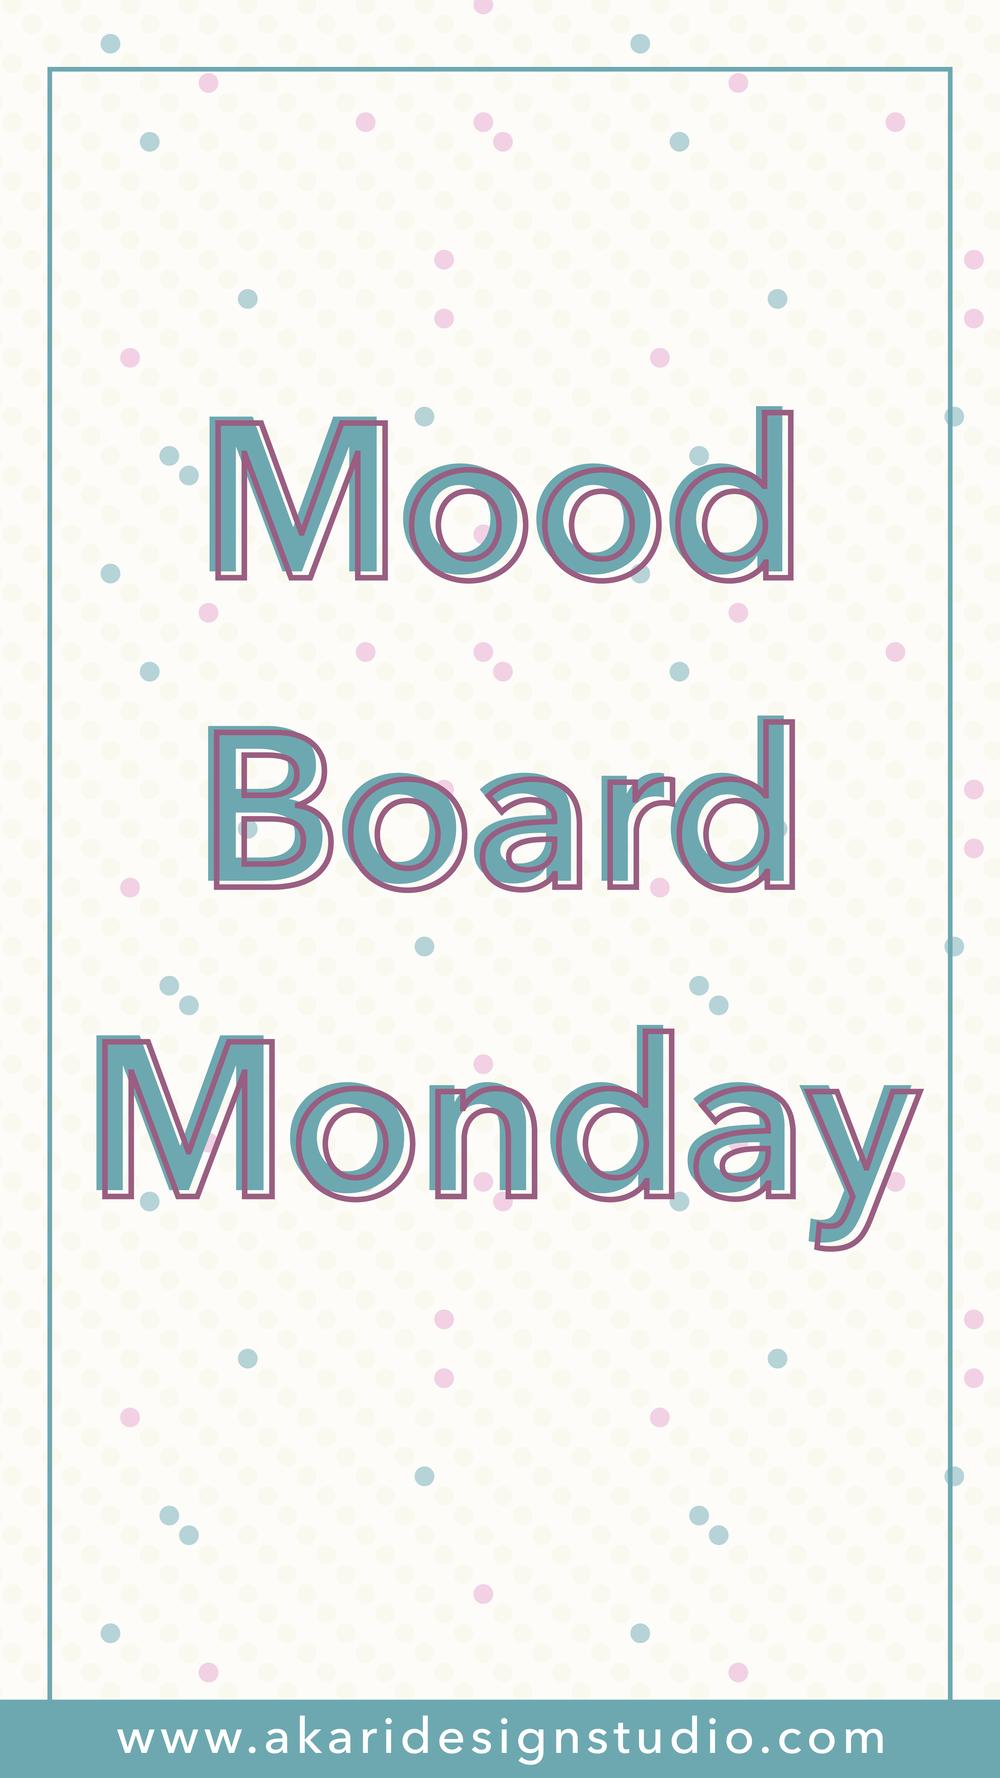 moodboard fashion. mood board design. pinterest mood board. design inpiration board. mood board example. mood board monday. mood board.